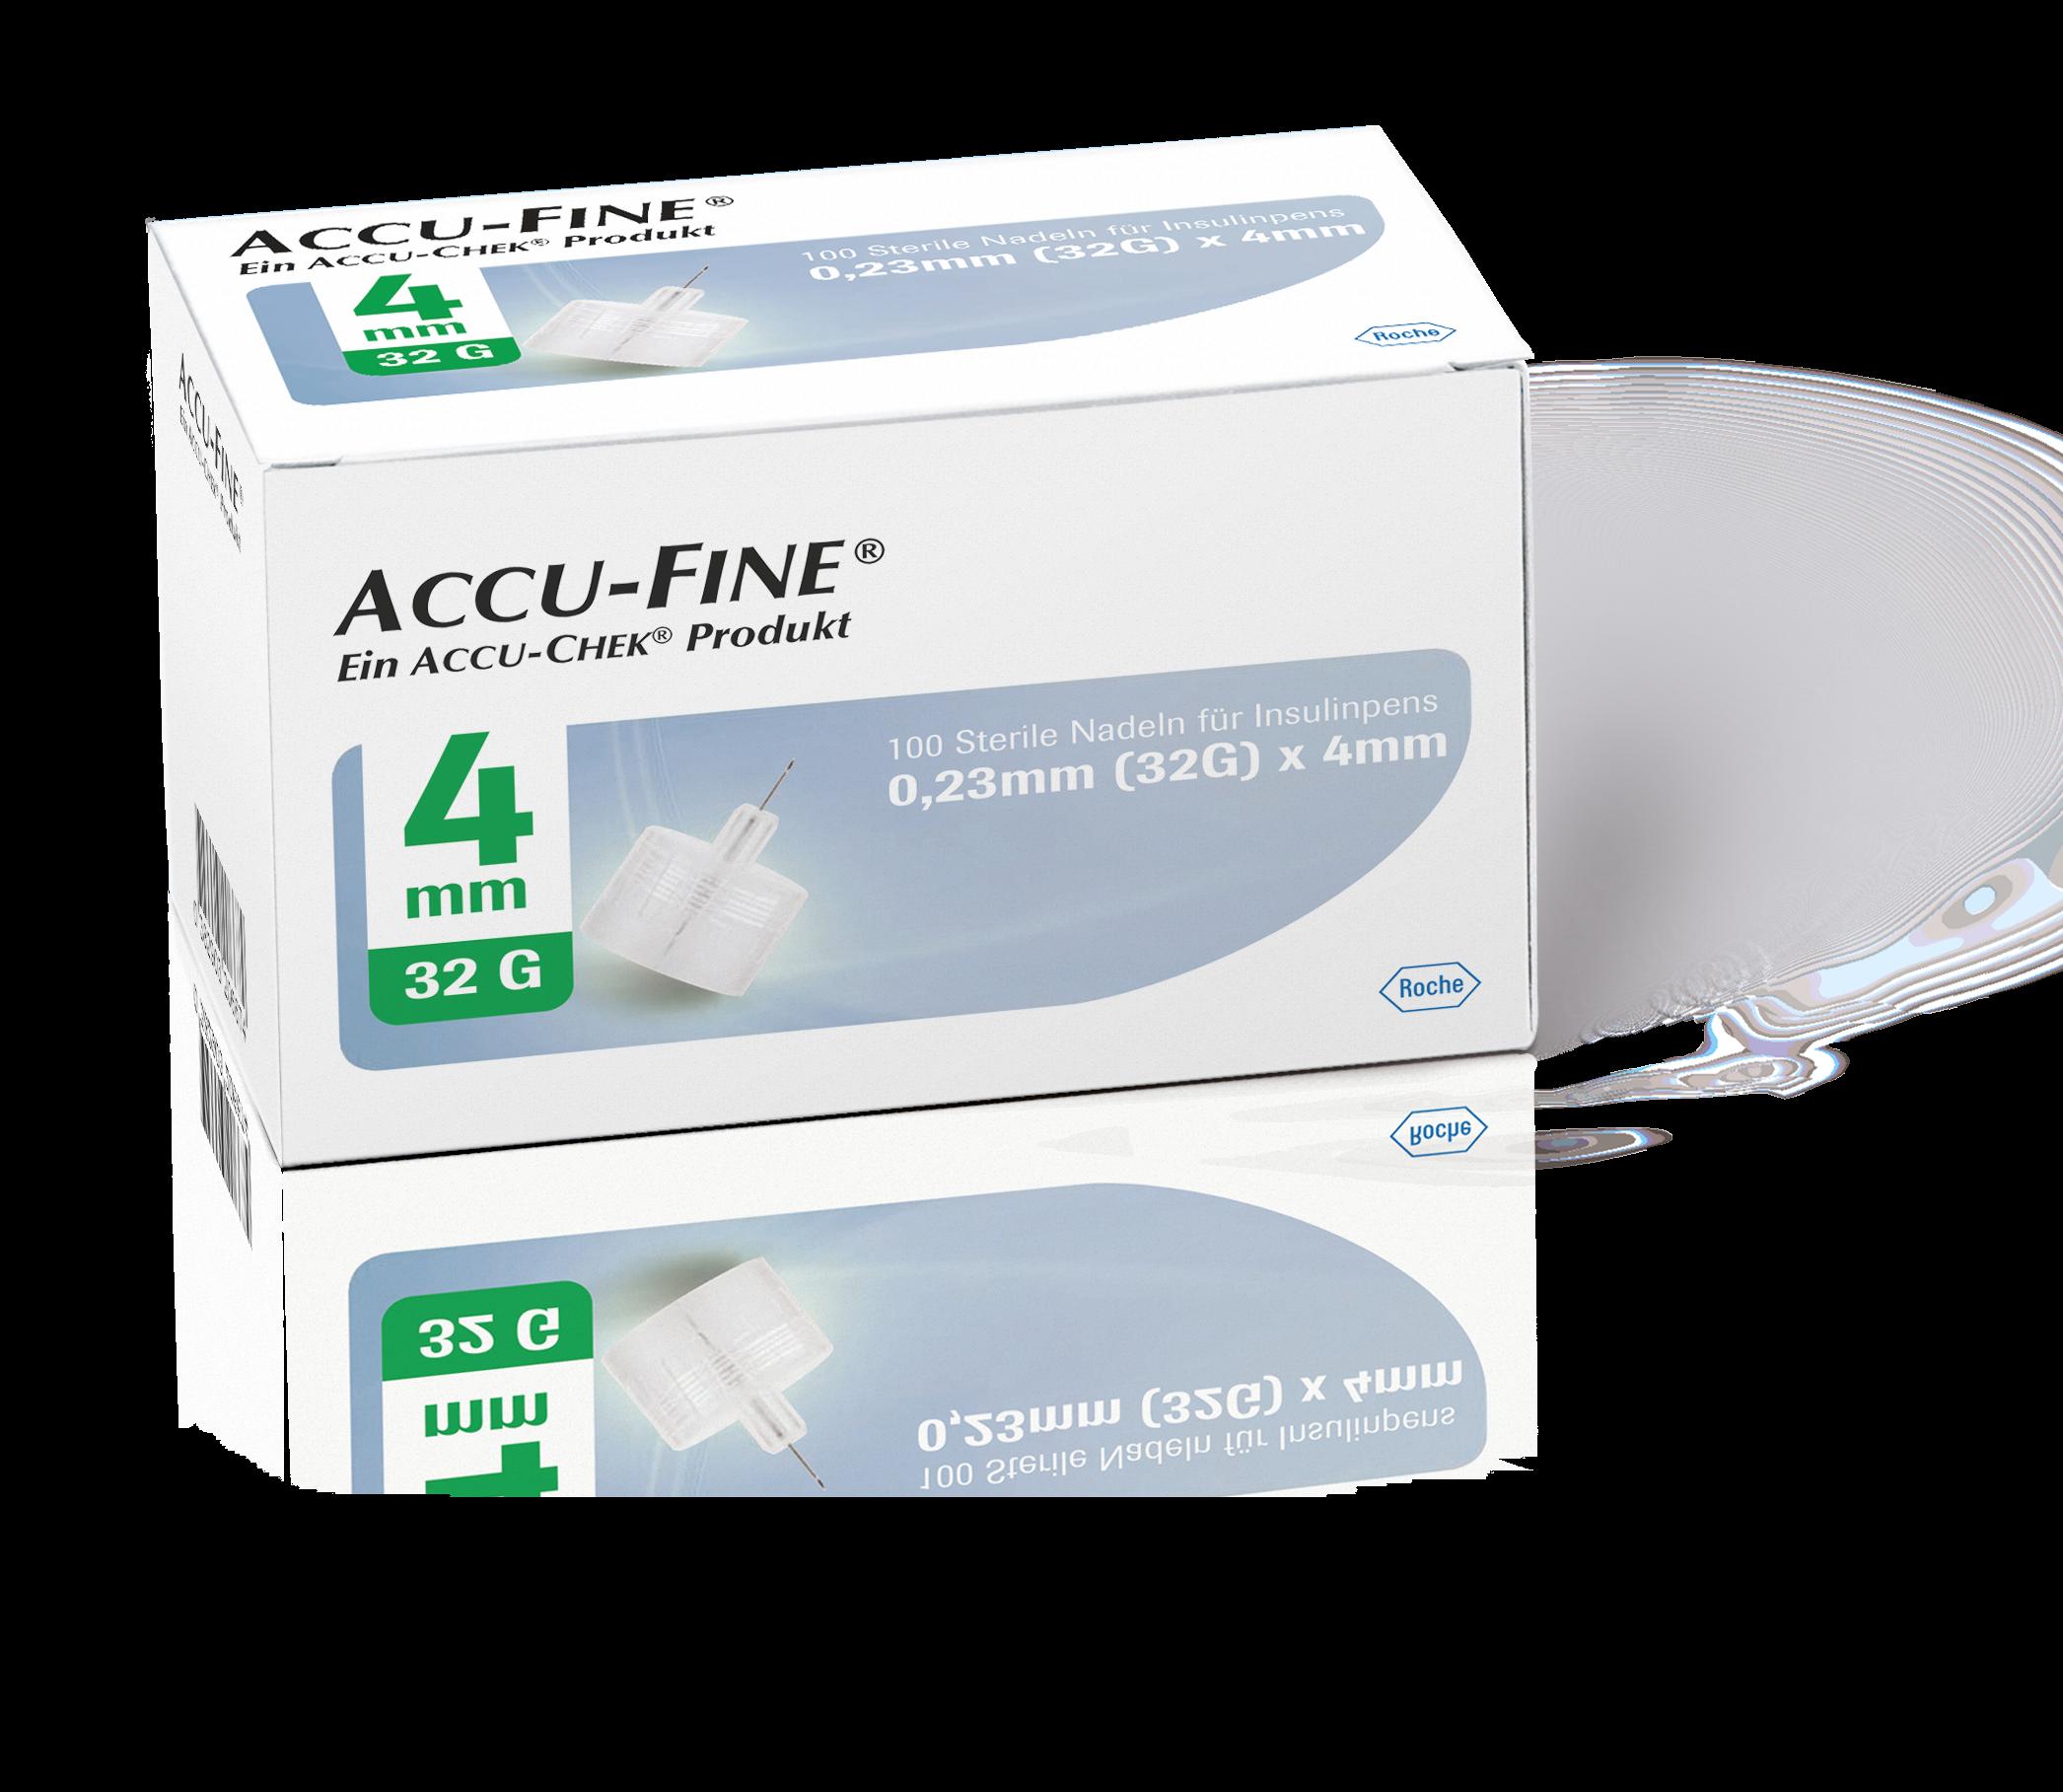 Accu-Fine Pen-Nadeln 32G 4mm 100 Stück